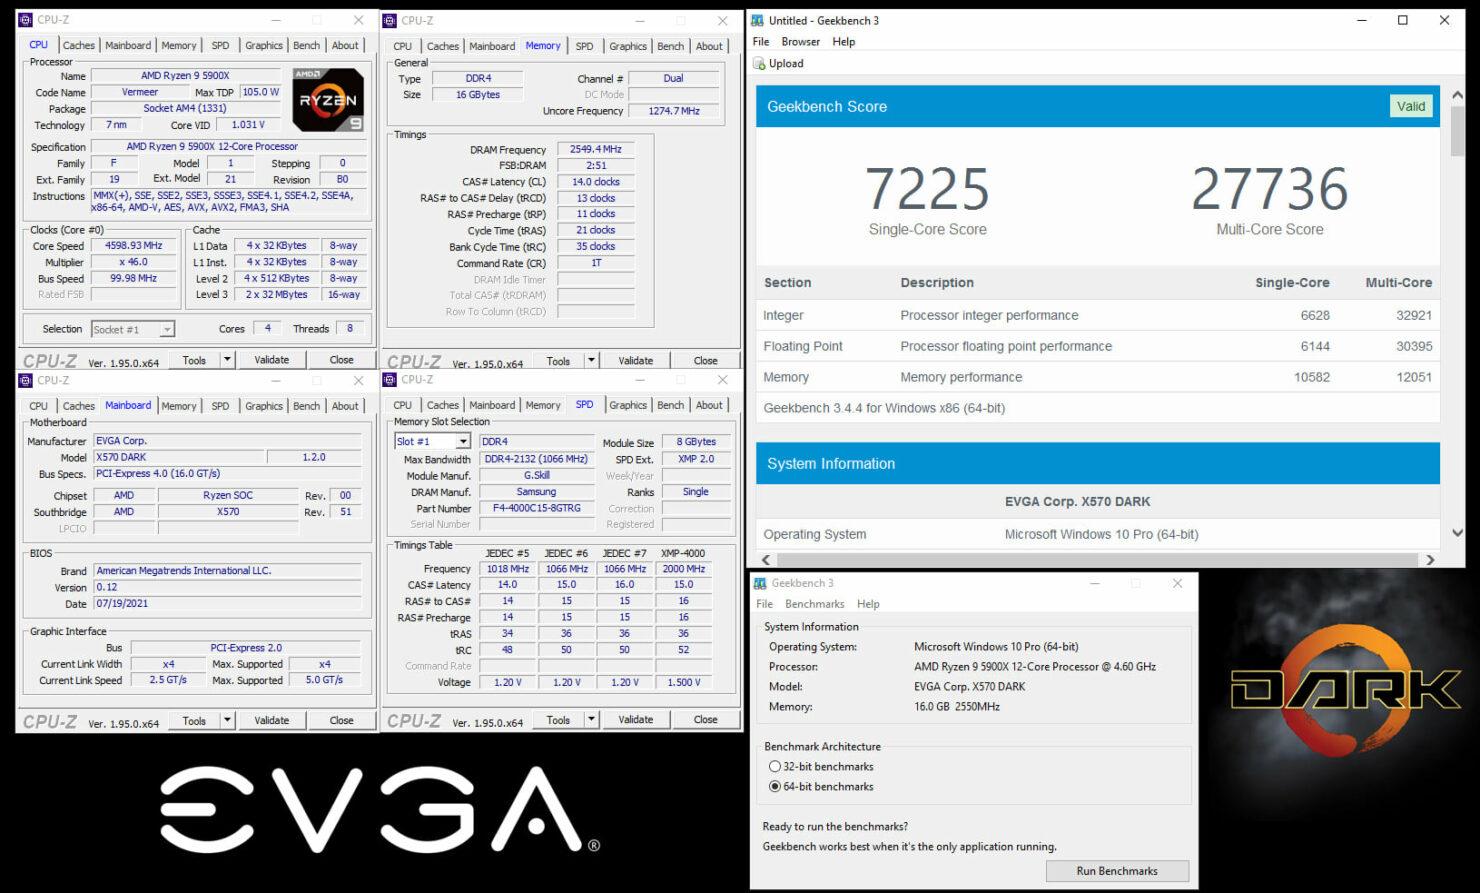 evga-x570-dark-motherboard-_-amd-ryzen-desktop-cpu-overclocking-benchmarks-_3